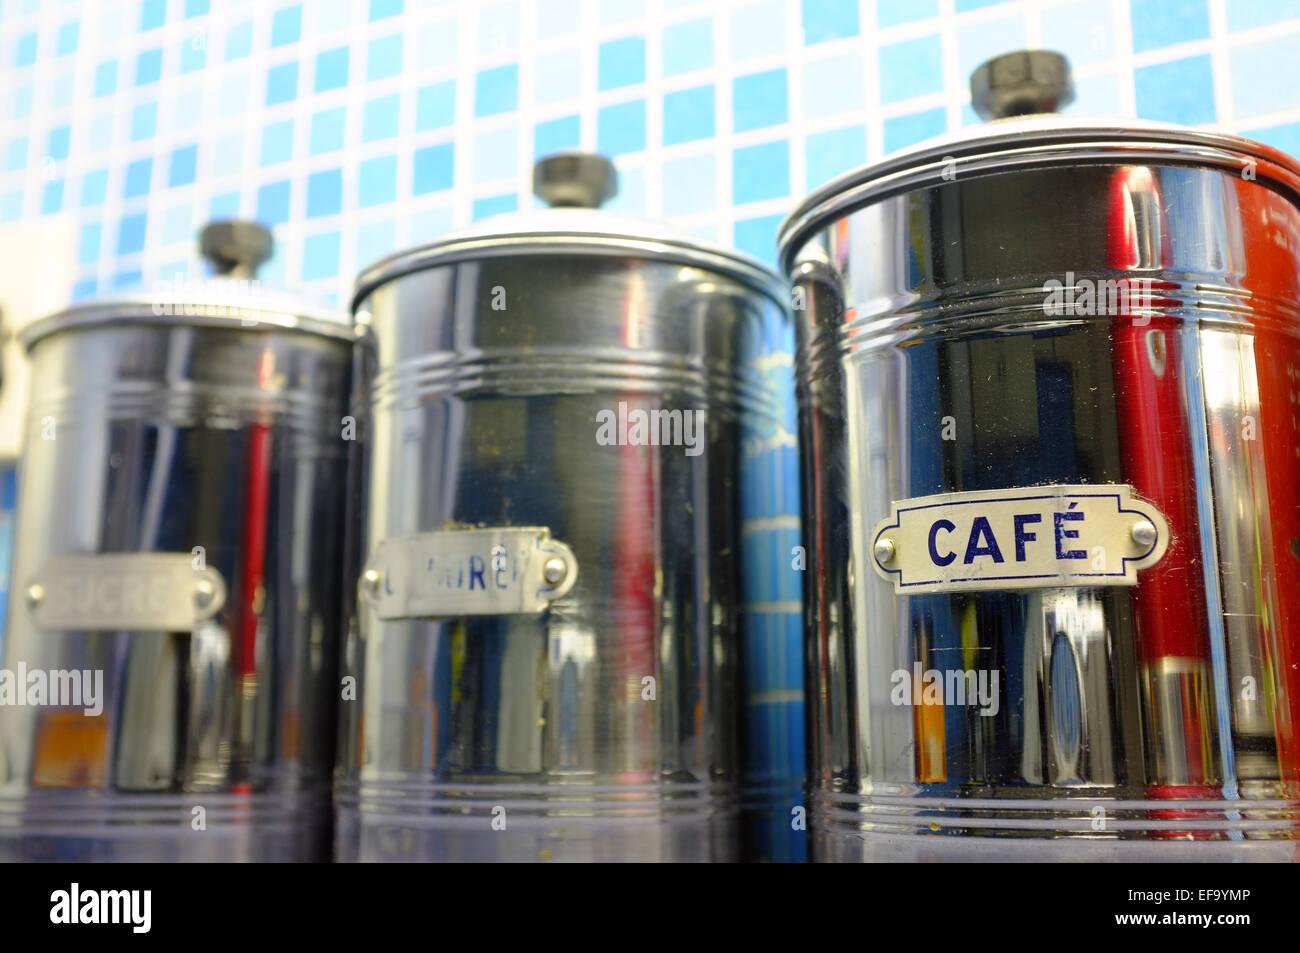 Stylish metal food storage tins on a kitchen counter. - Stock Image